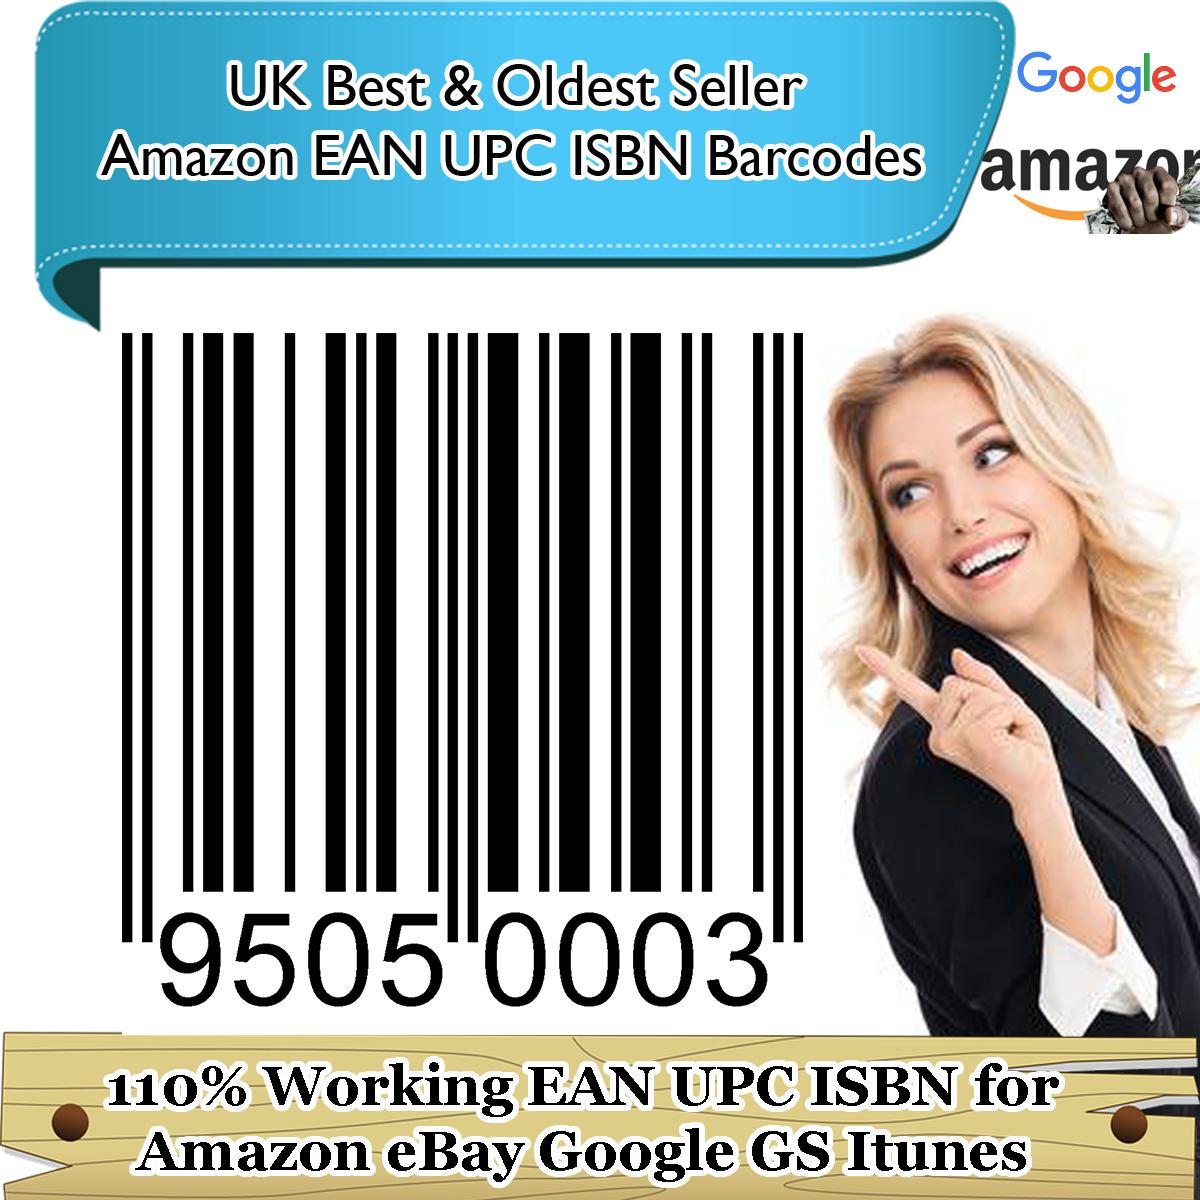 5000 X Upc Codes Numbers Barcodes For Ebay Amazon Google Itunes Listings Uk Eu Us All Marketplaces Codesforamazon Com